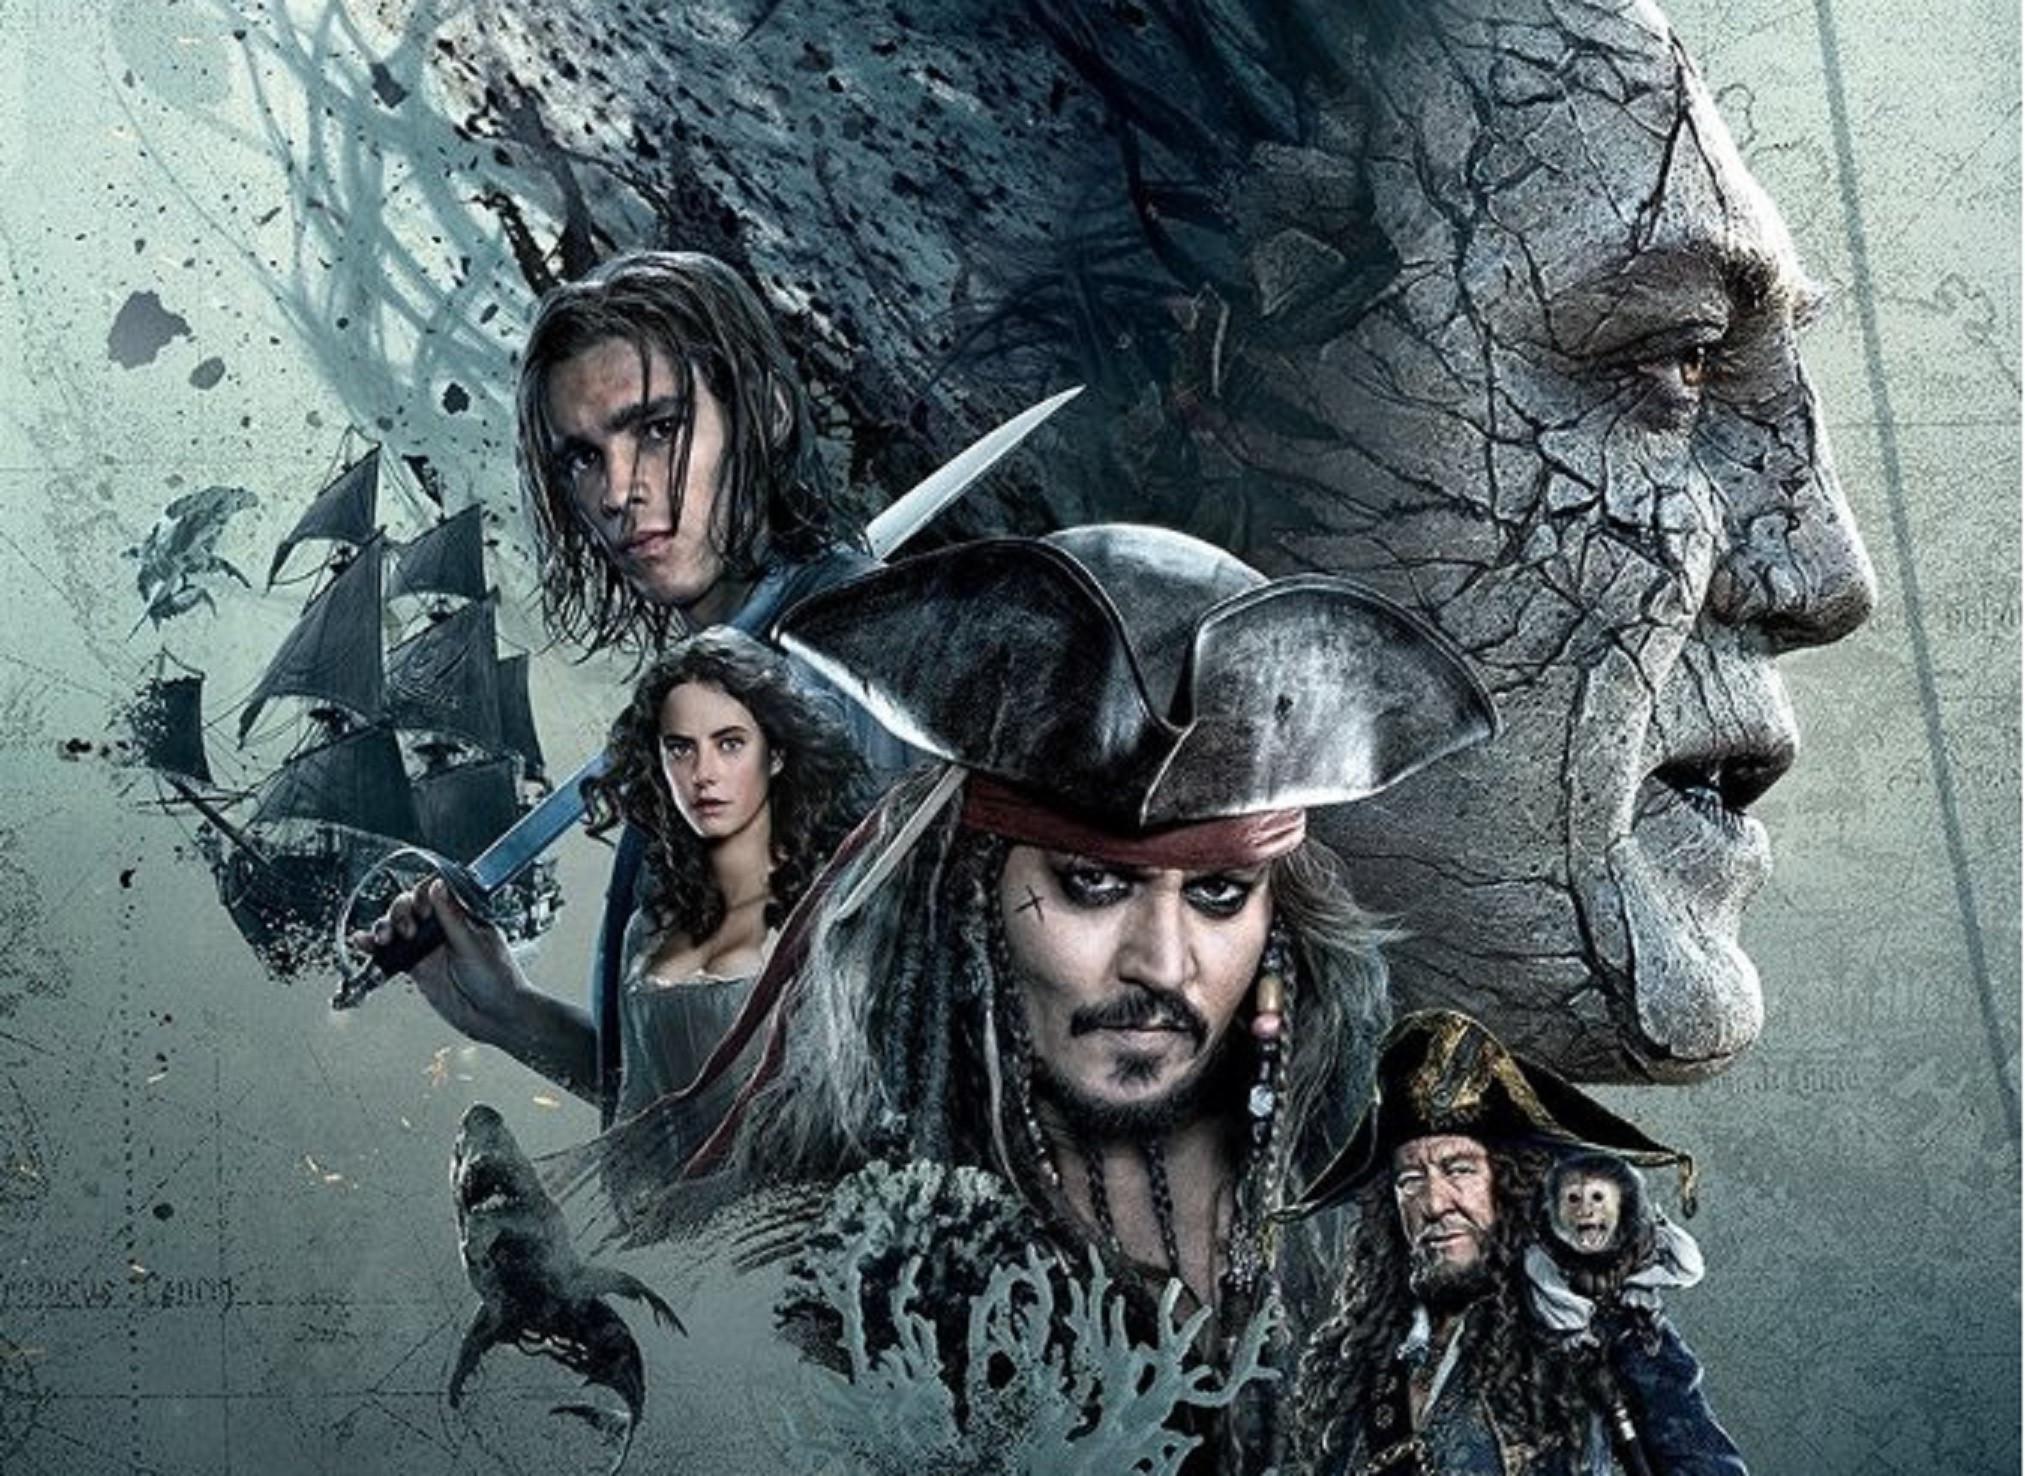 Pirates of the Caribbean: Dead Men Tell No Tales (IMDb)